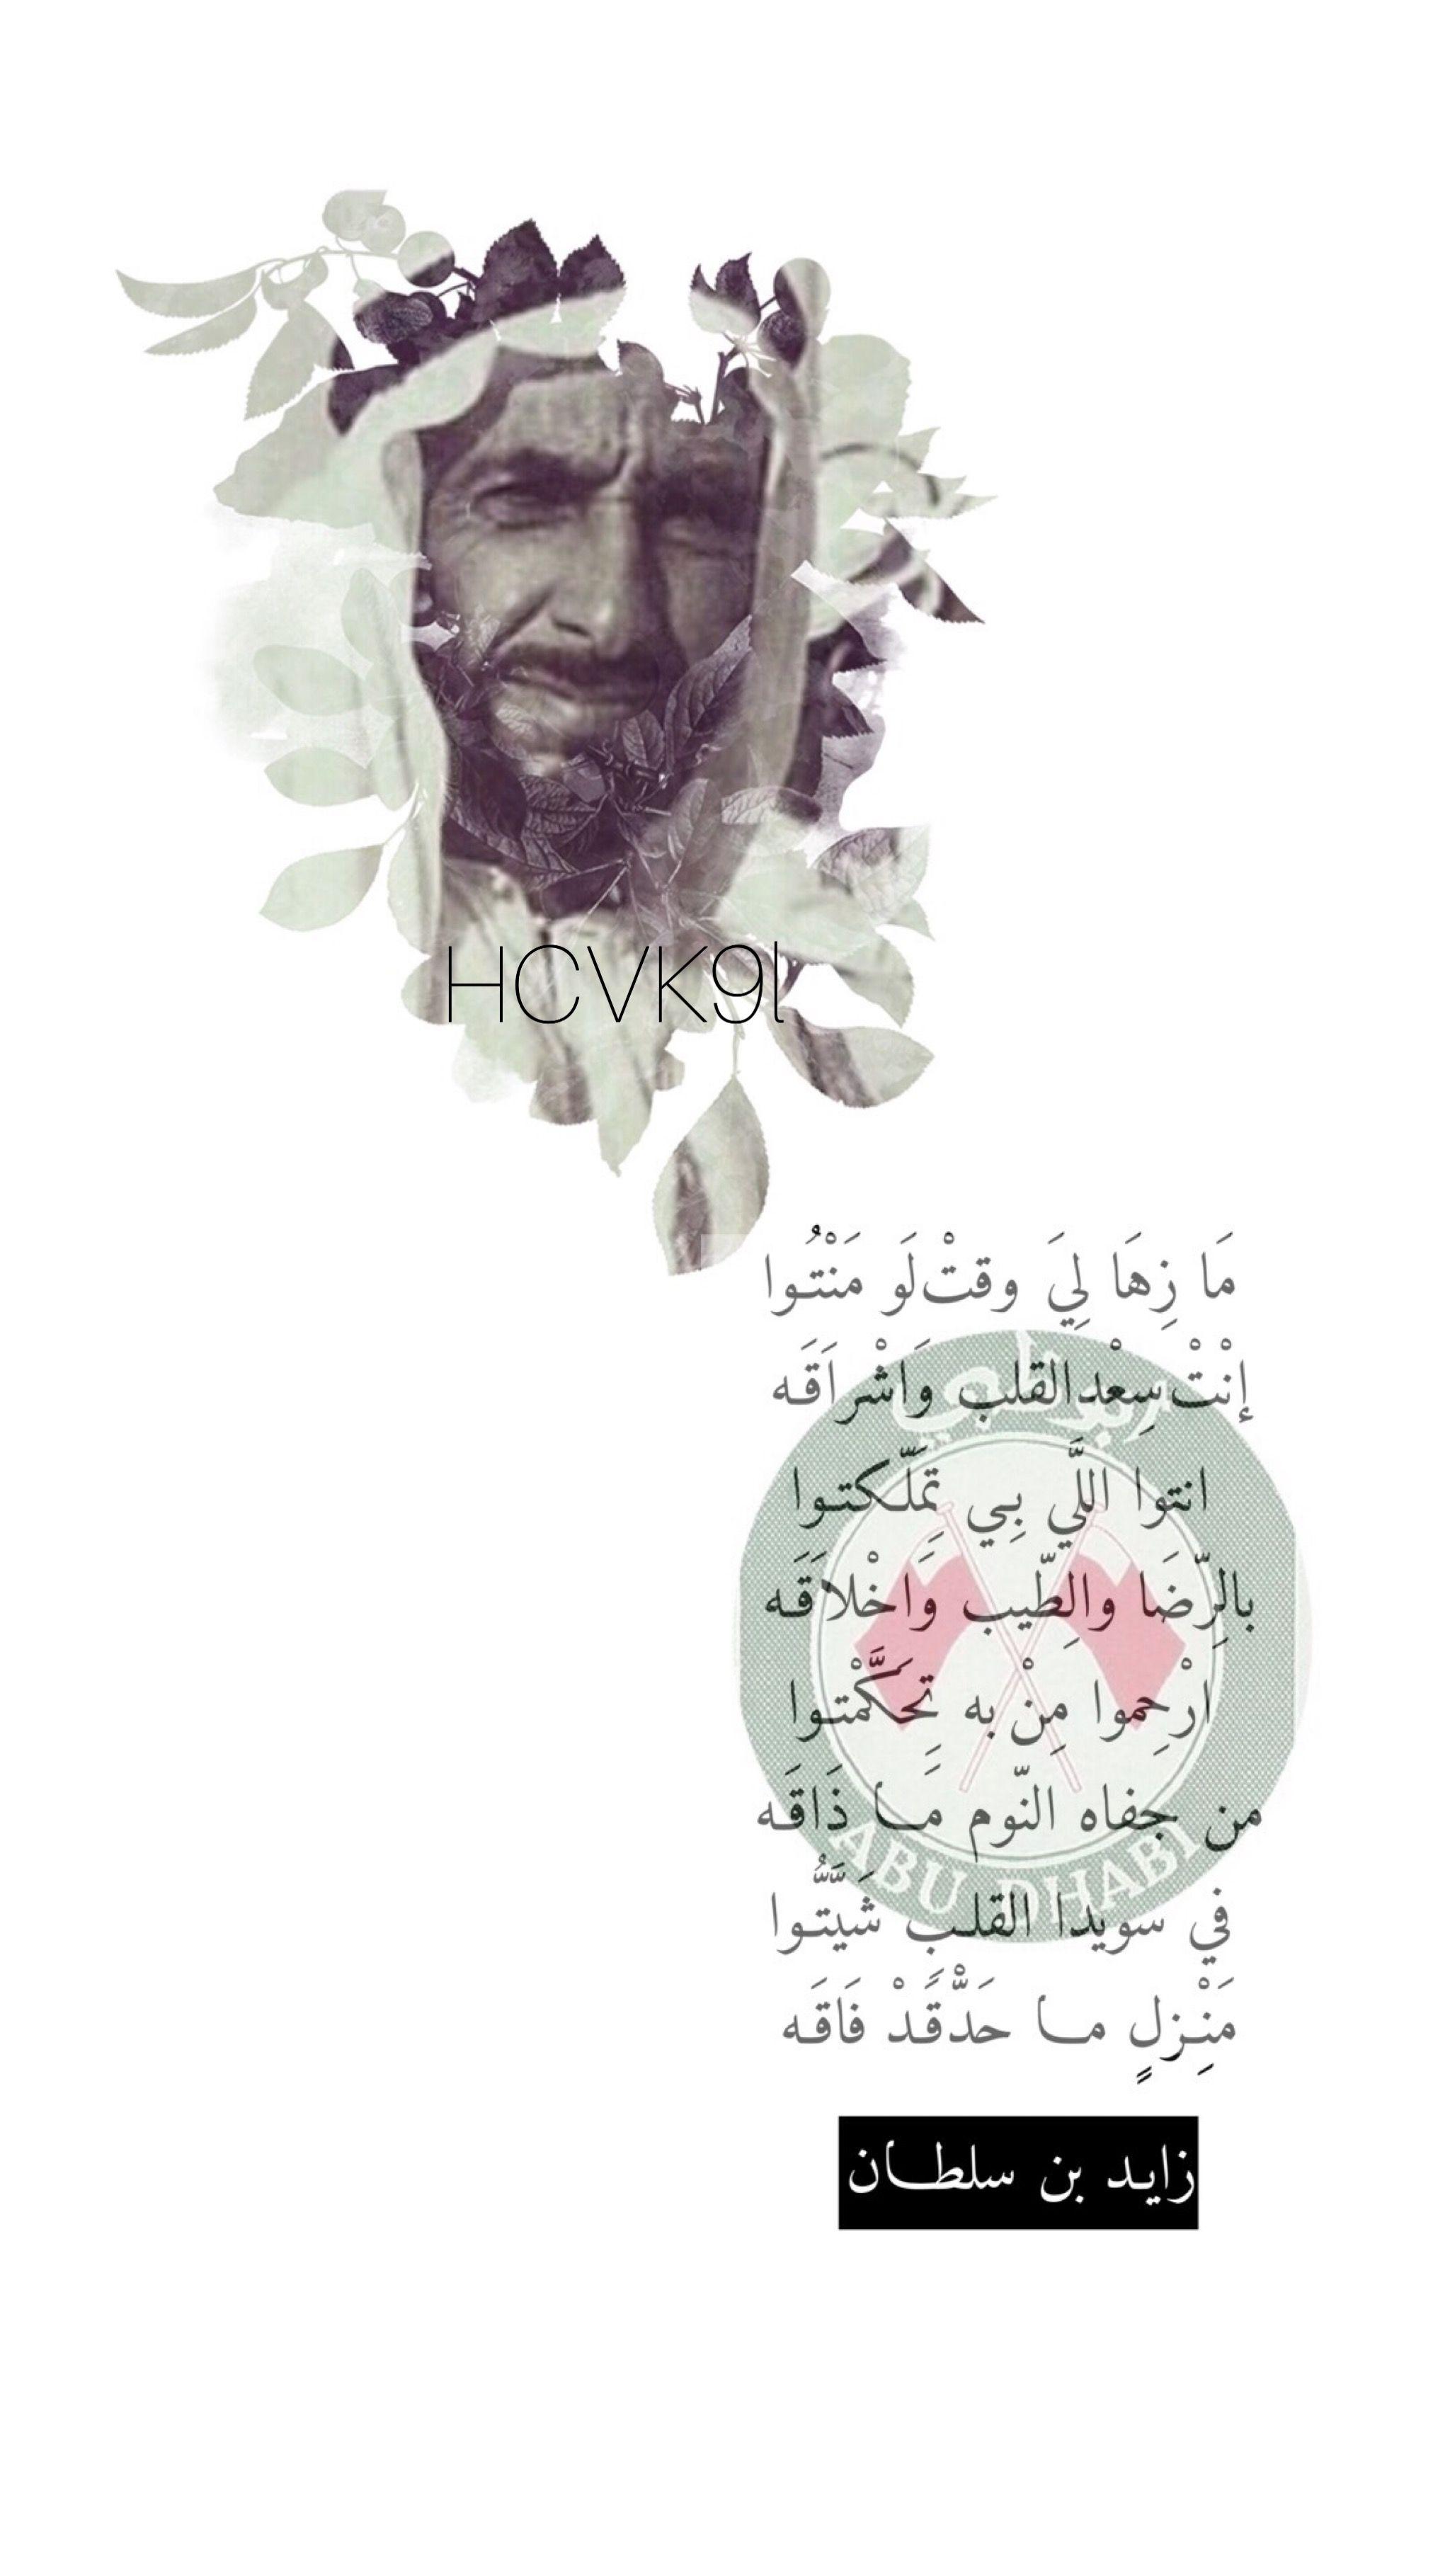 زايد بن سلطان Beautiful Arabic Words Oprah Quotes Start Quotes